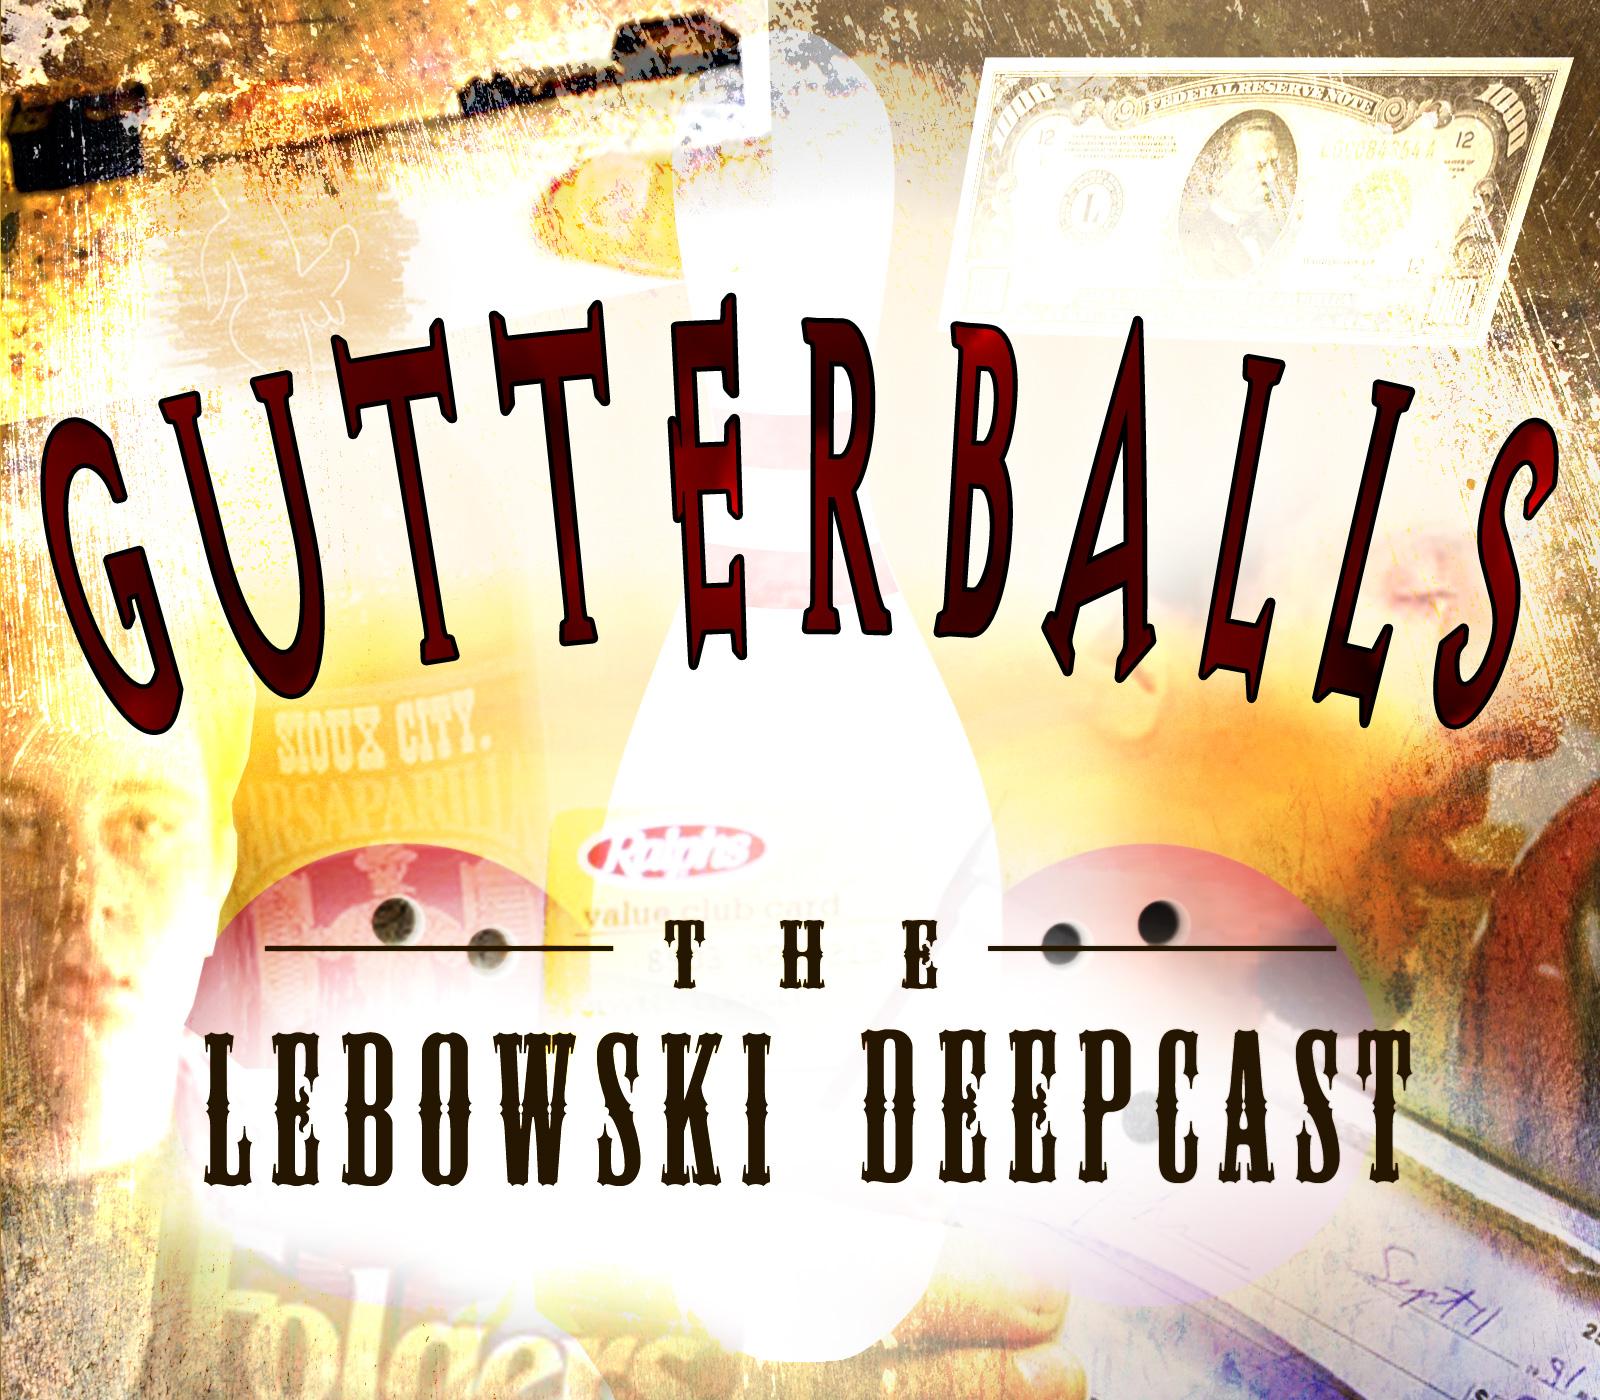 Gutterballs: The Big Lebowski Deepcast